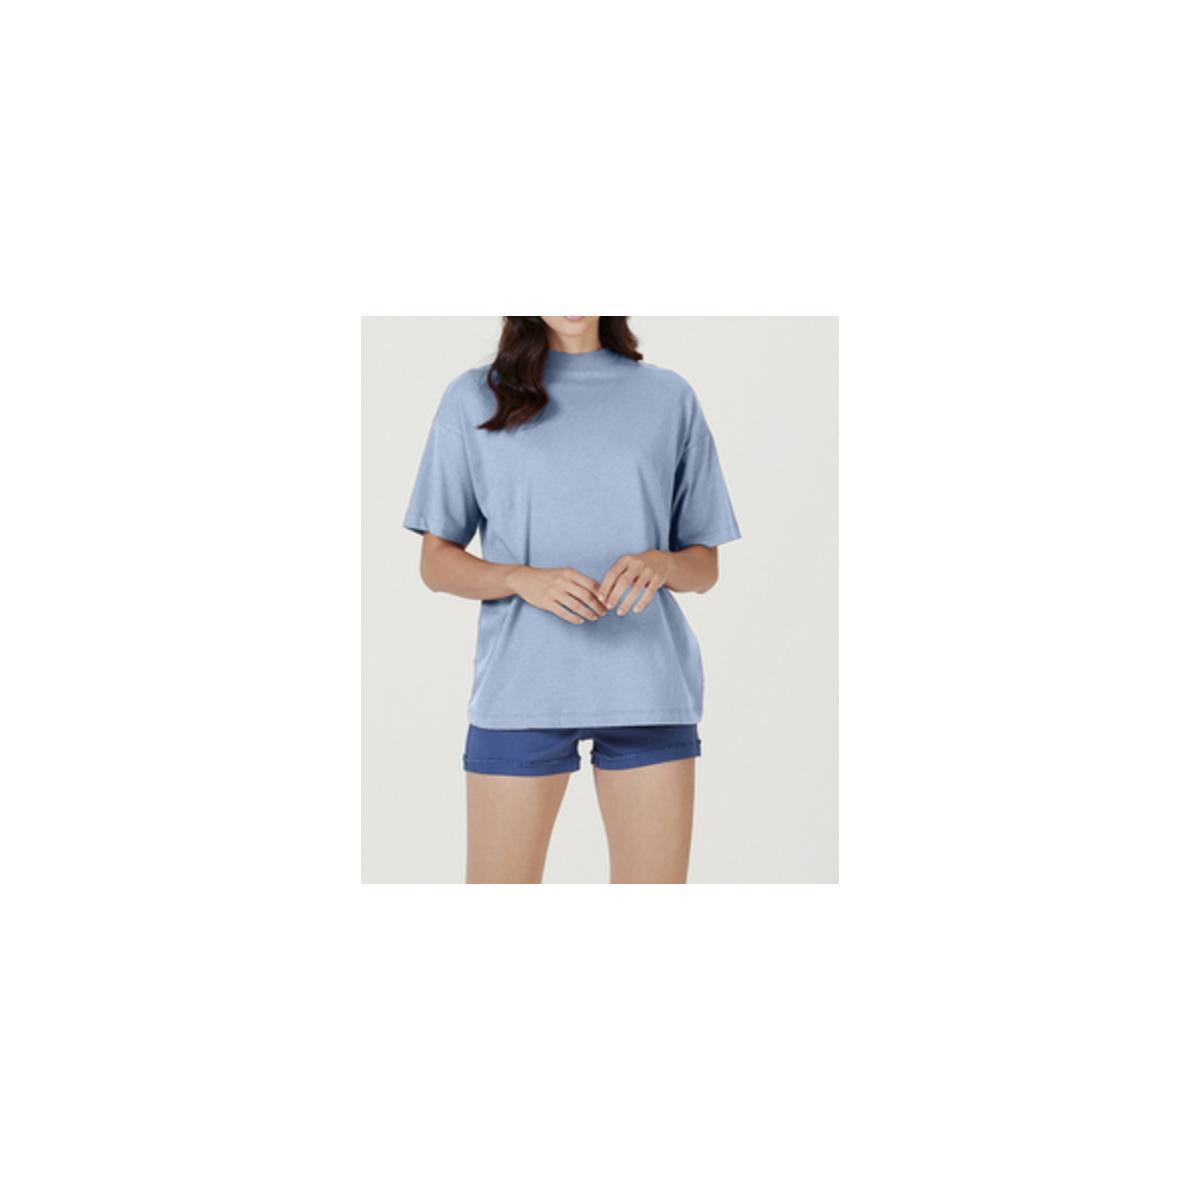 Blusa Feminina Hering 4ez7 Az8en Azul